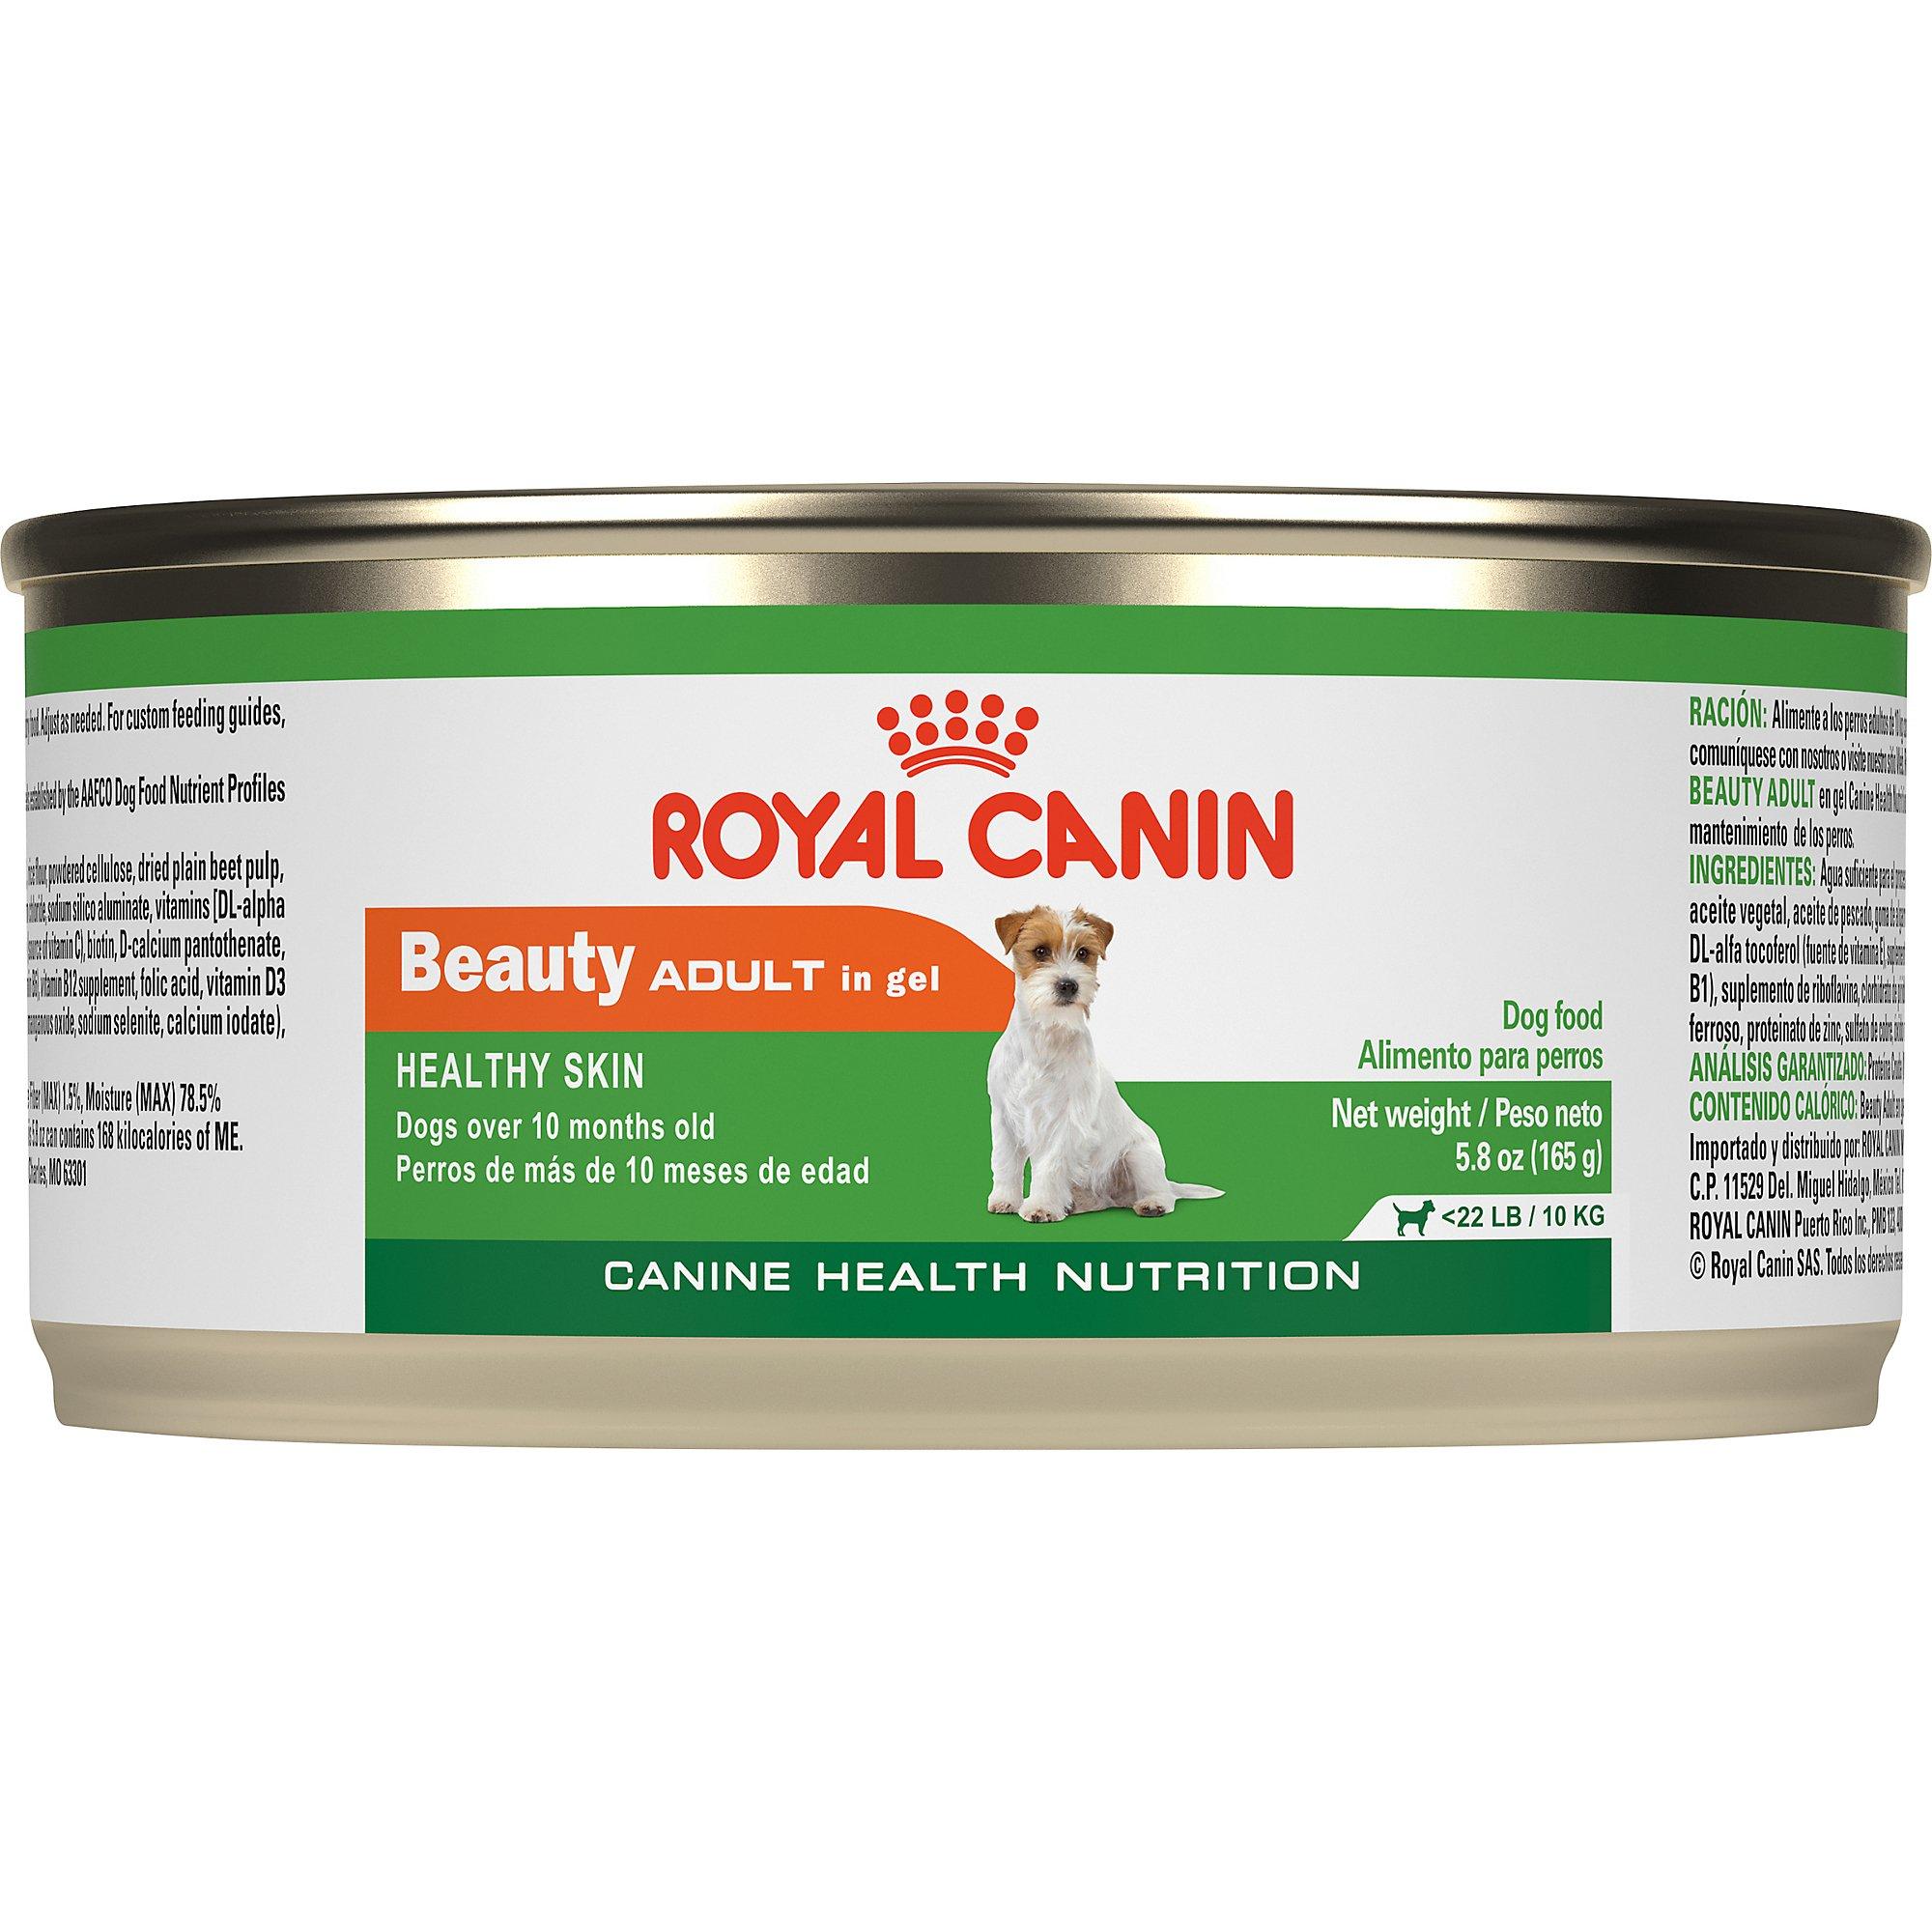 Royal Canin Beauty Adult Canned Dog Food   Oz